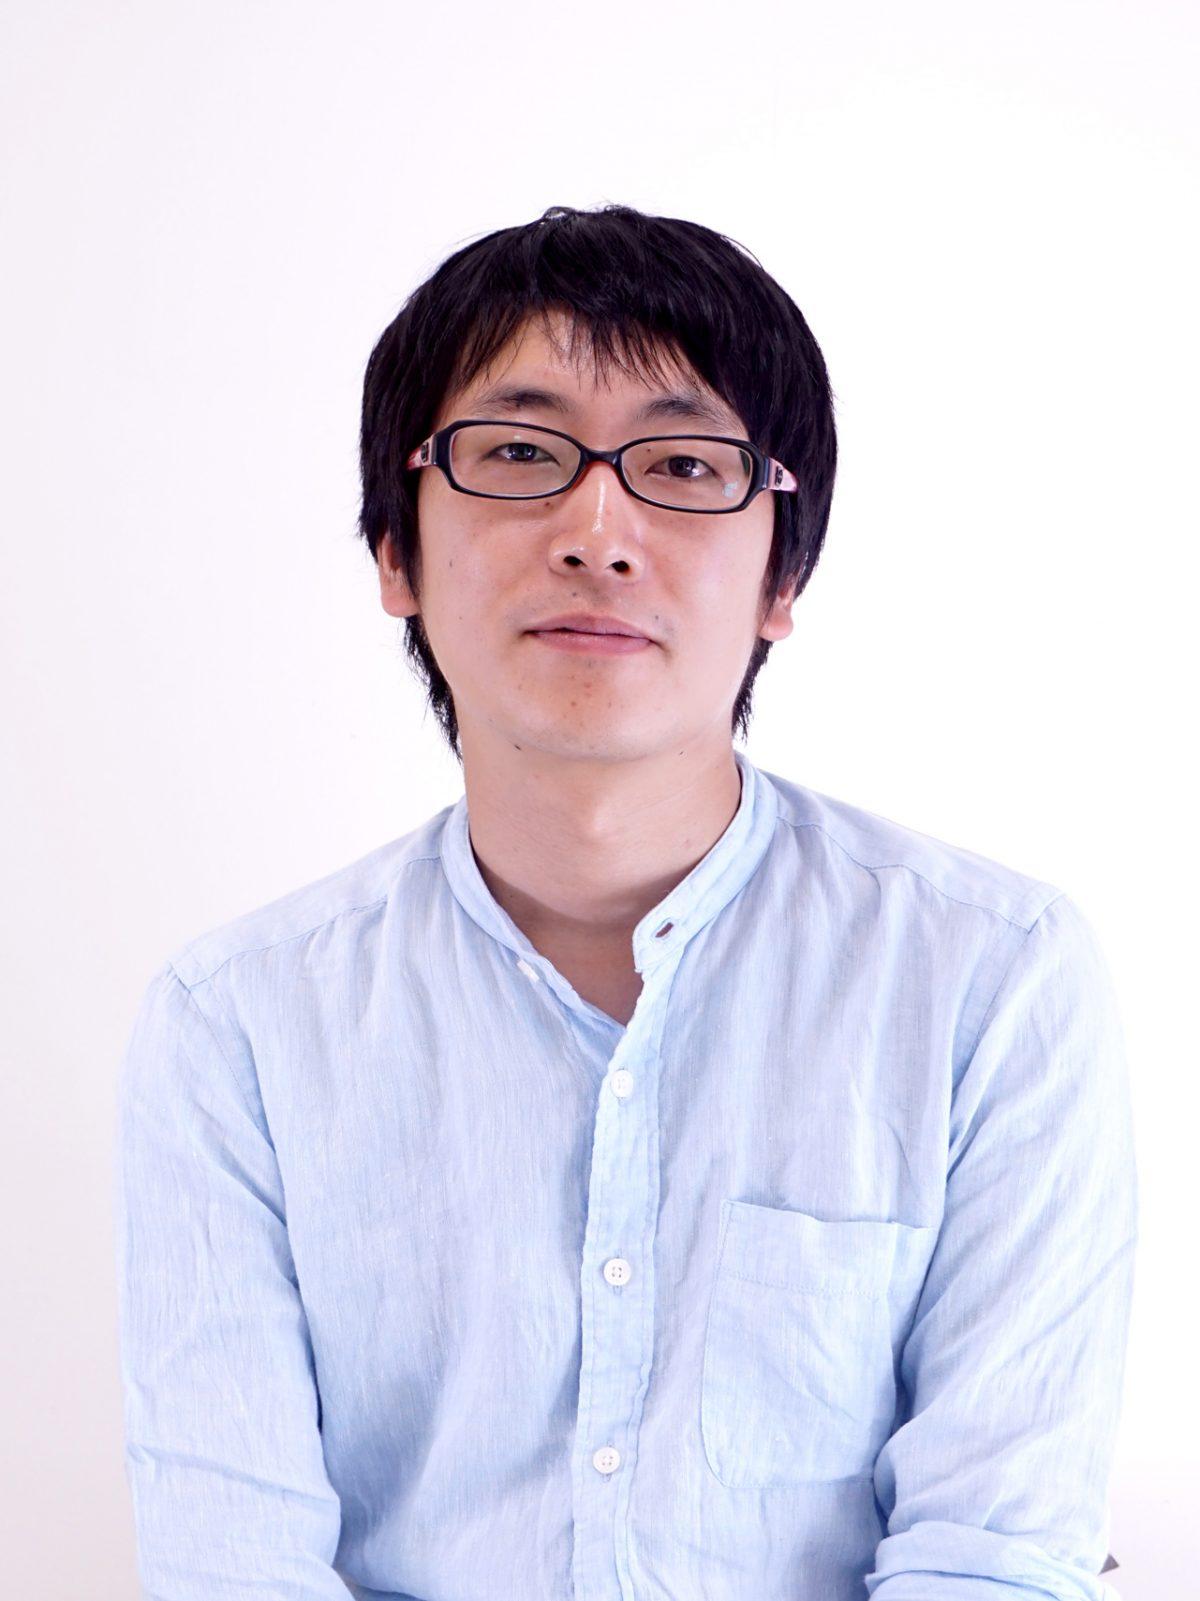 伊藤毅Tsuyoshi Itou